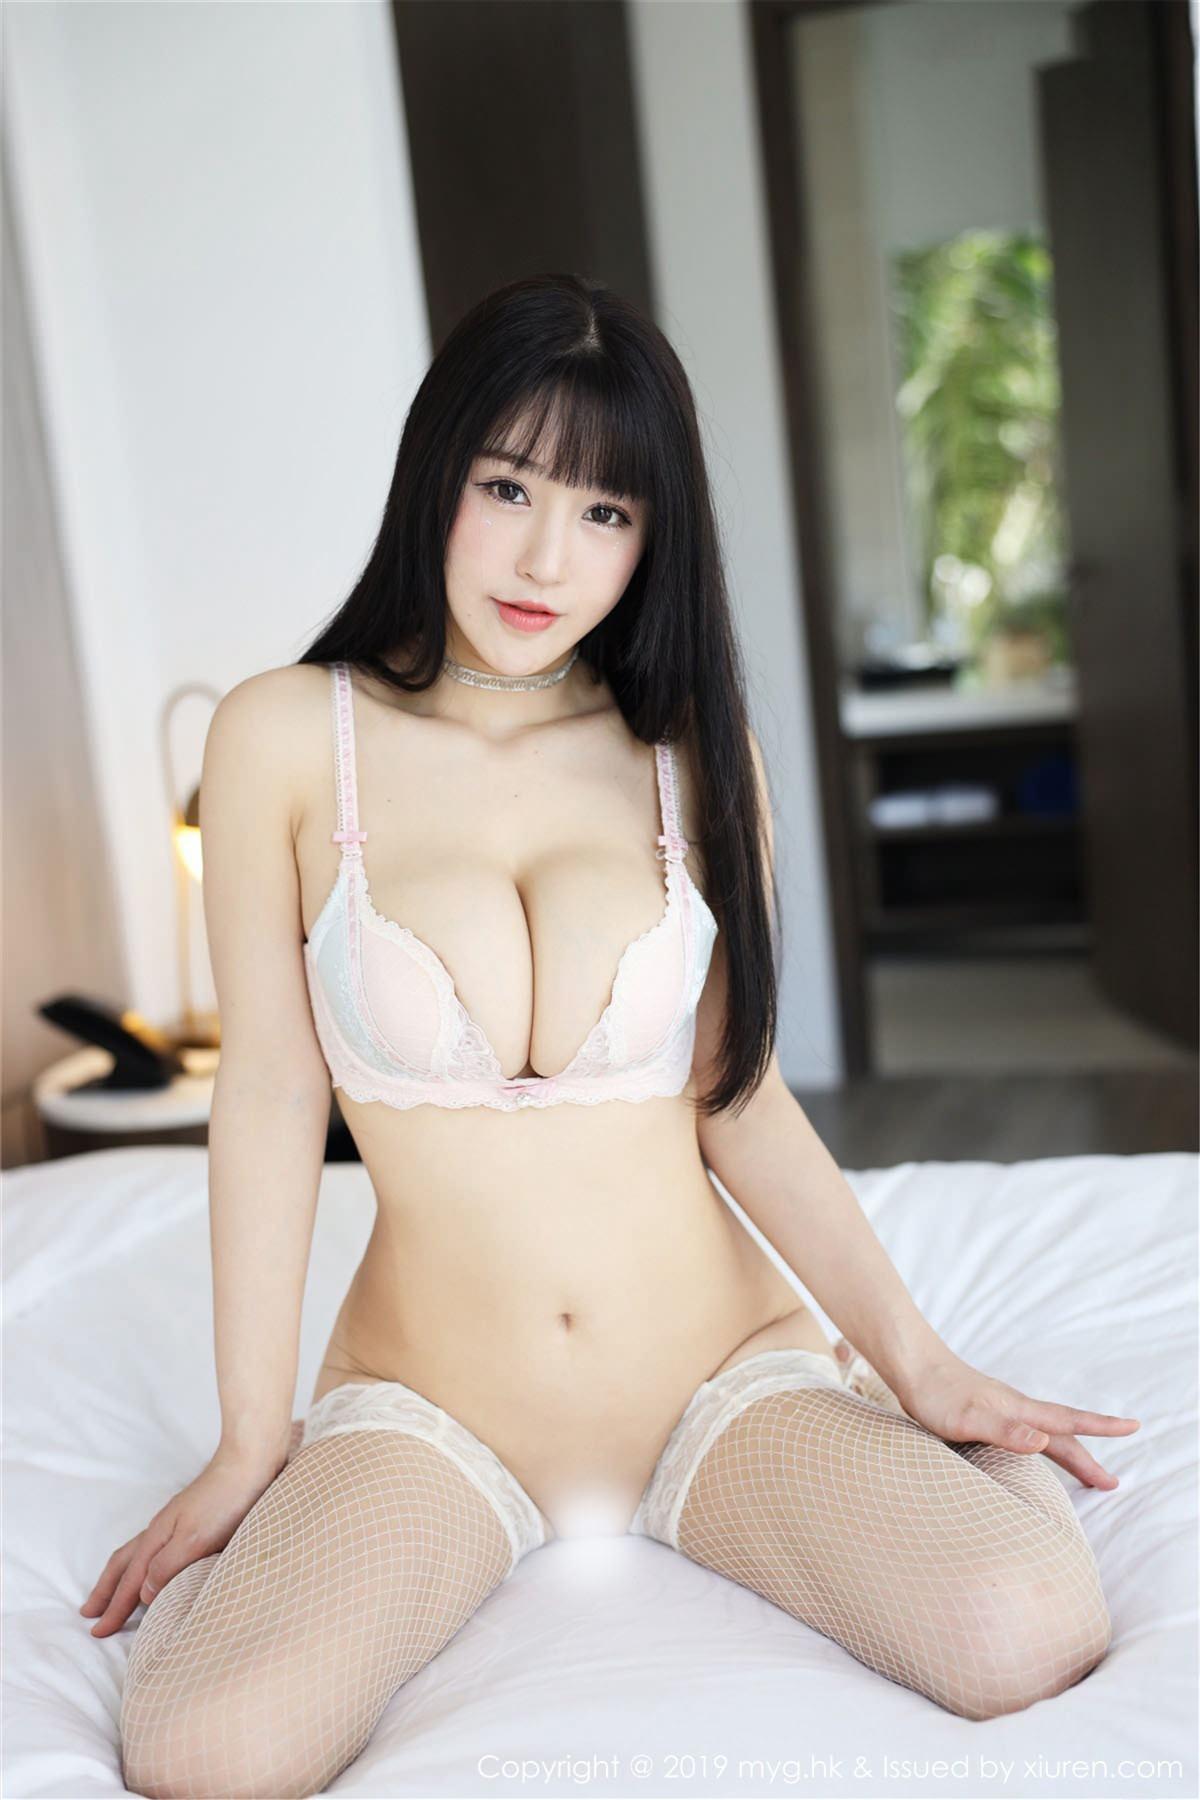 MyGirl Vol.364 25P, mygirl, Zhu Ke Er